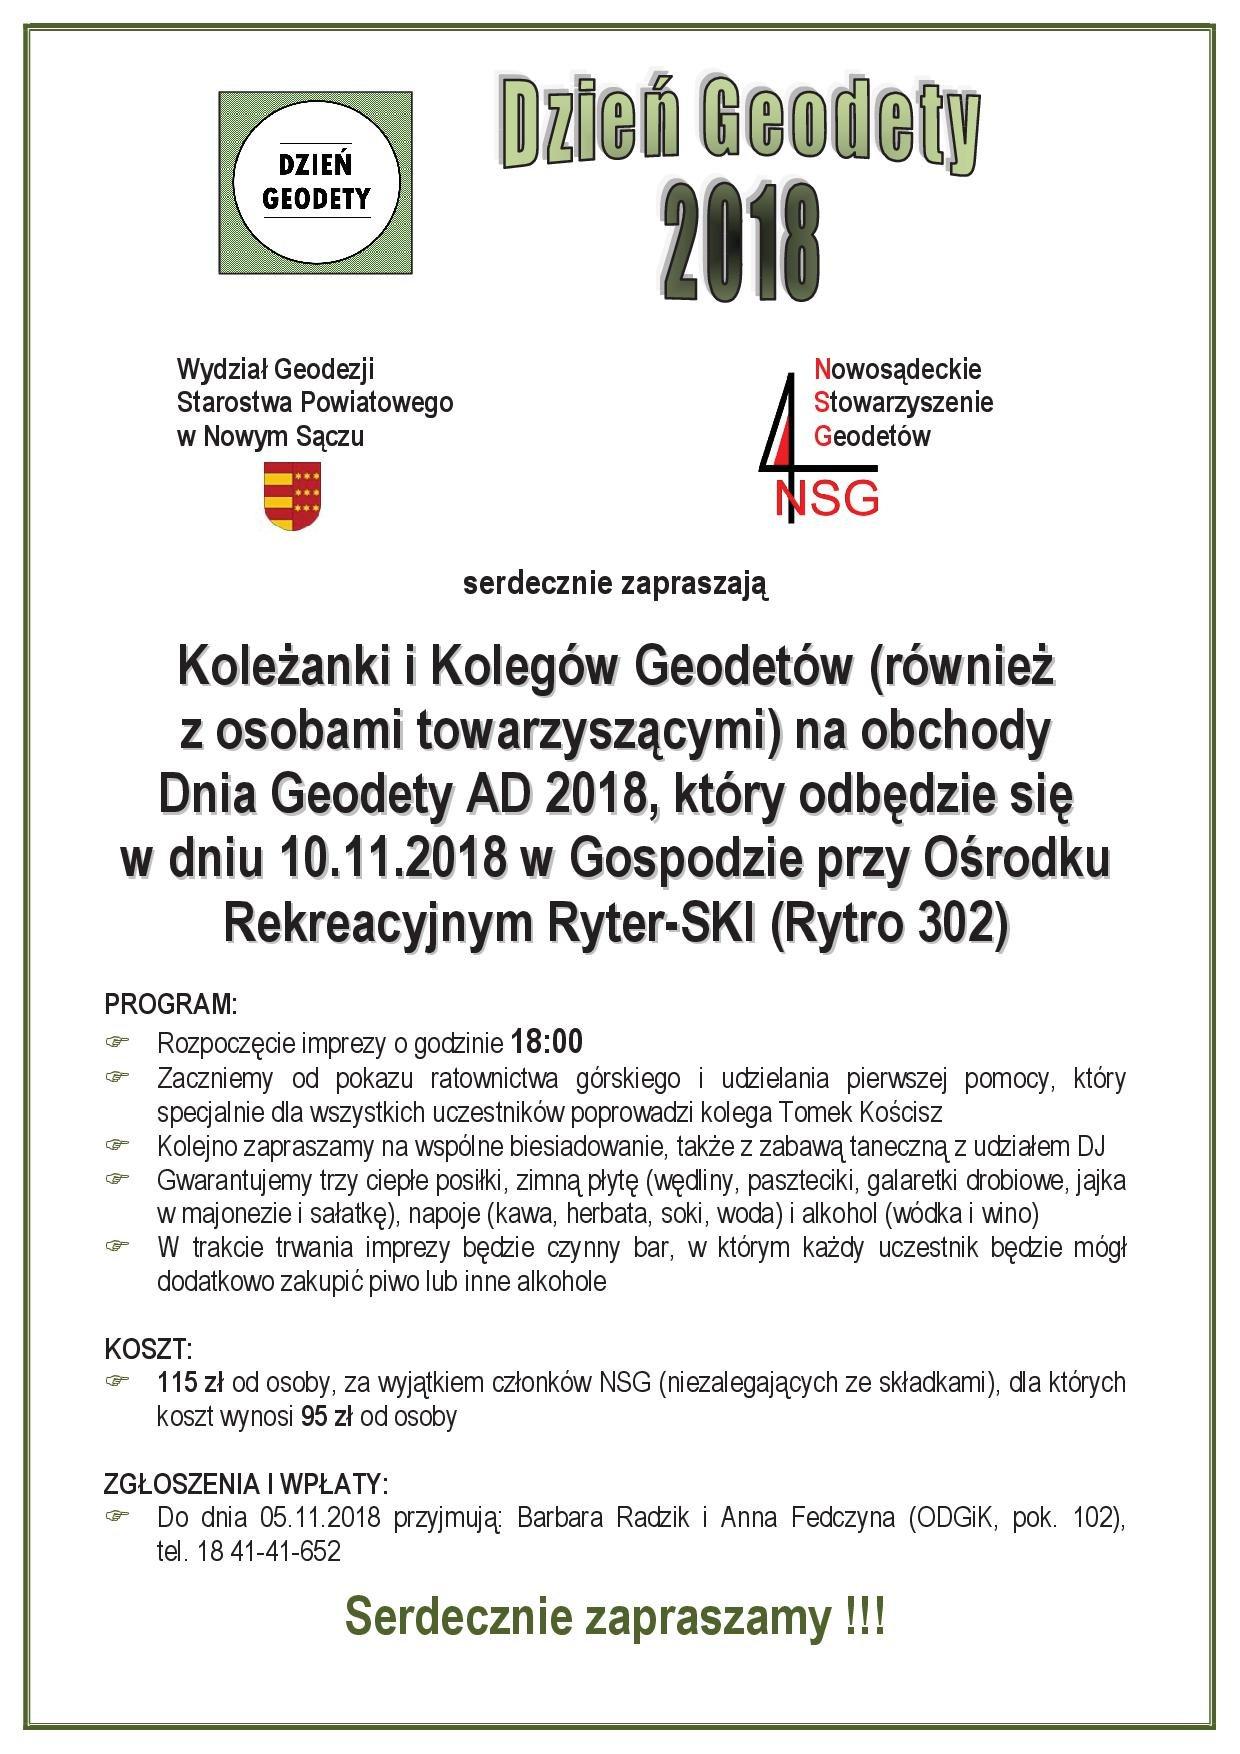 dziec584-geodety-2018-plakat